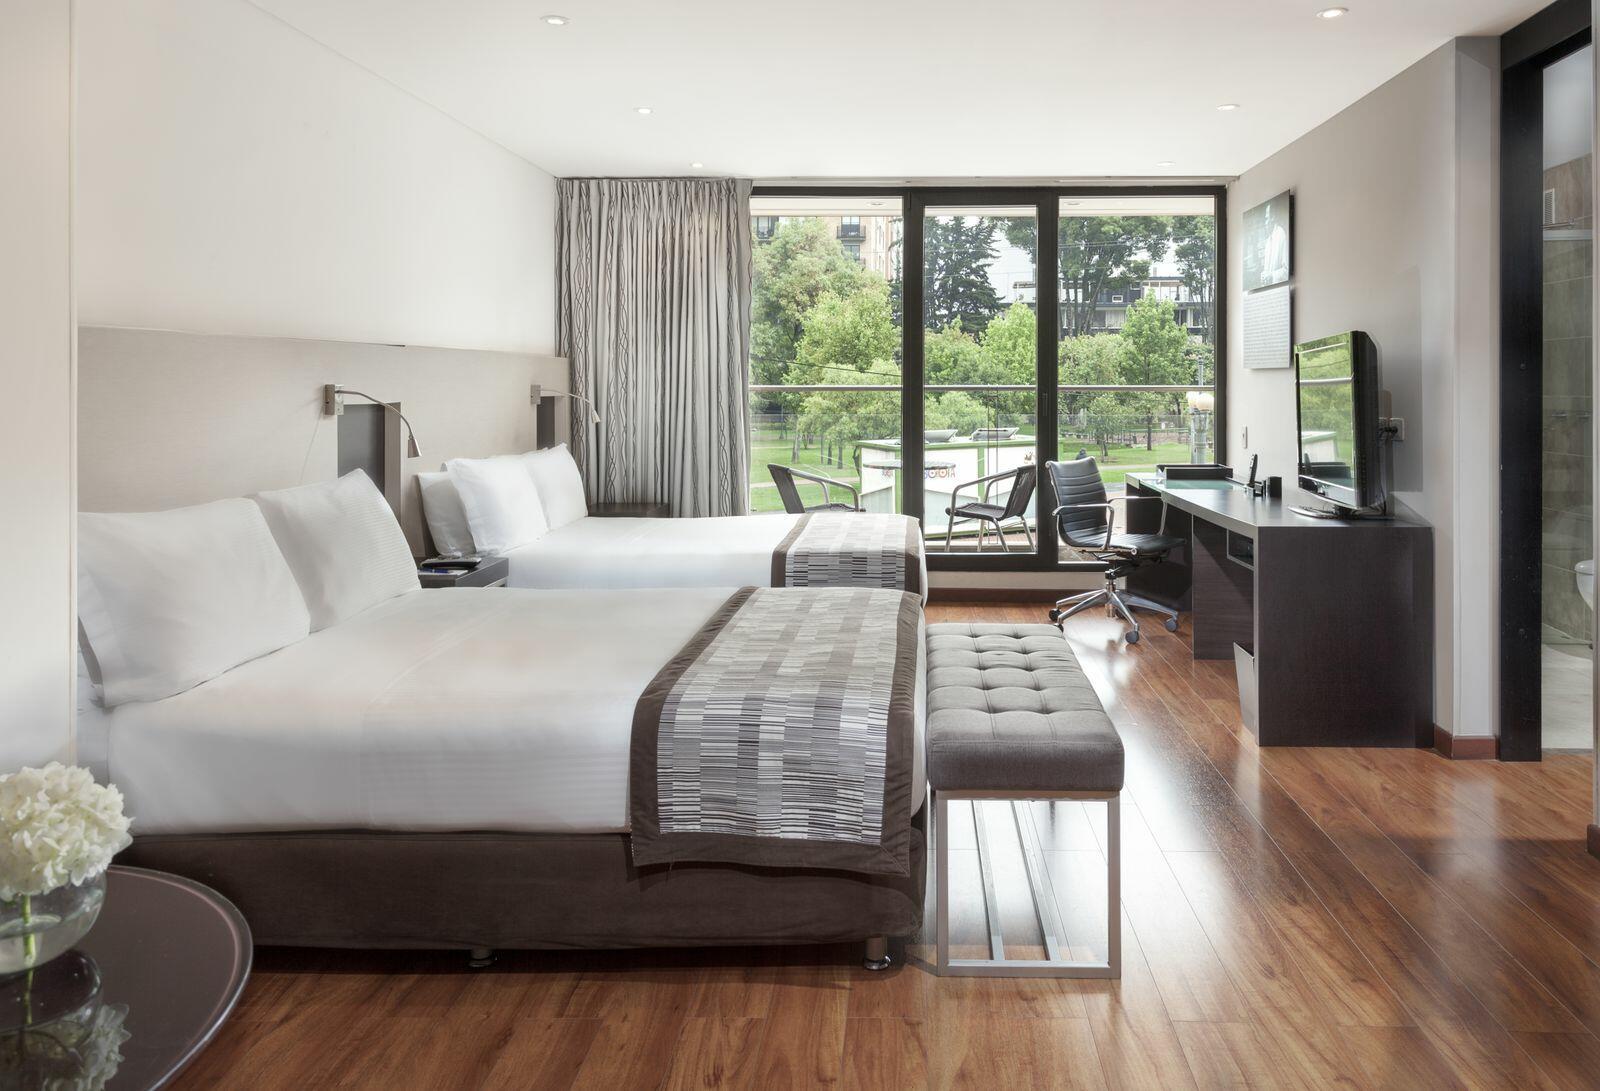 Double Bed Standard Room